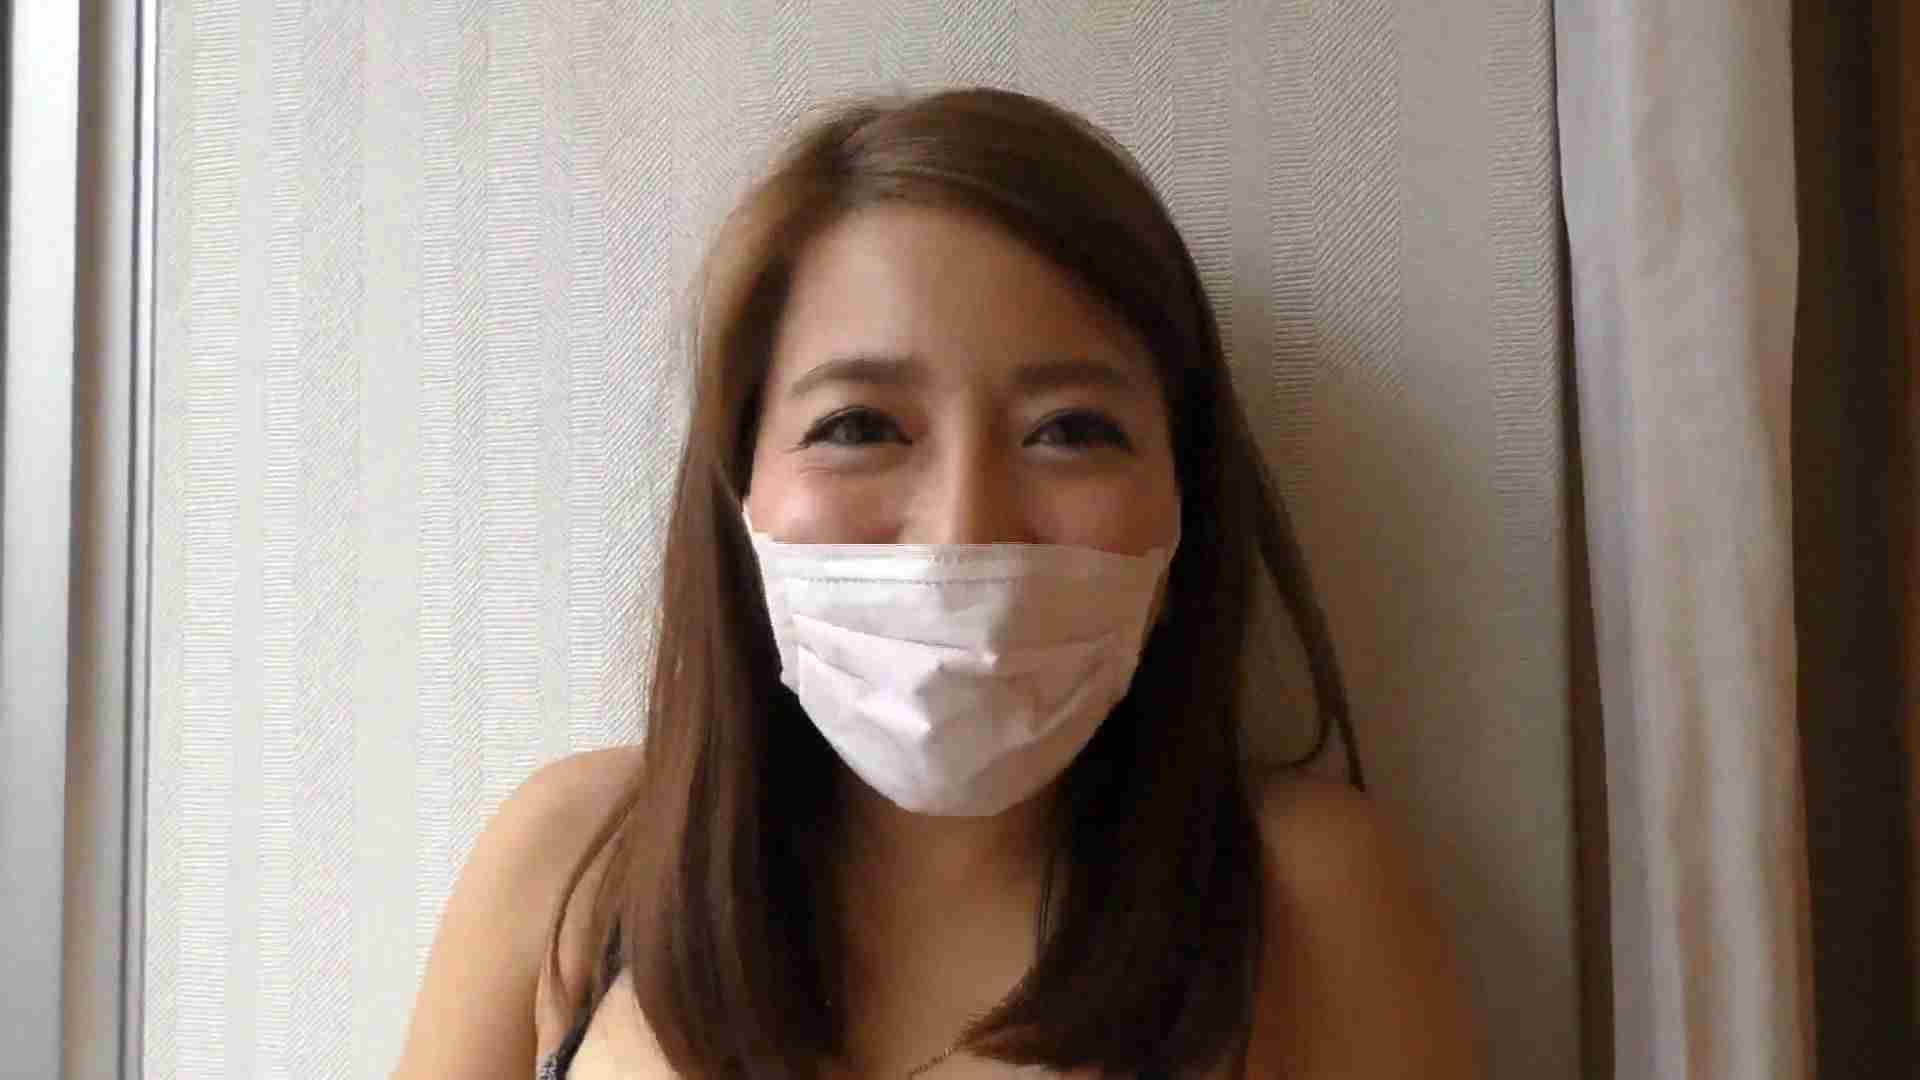 S級厳選美女ビッチガールVol.21 美女OL  101連発 39